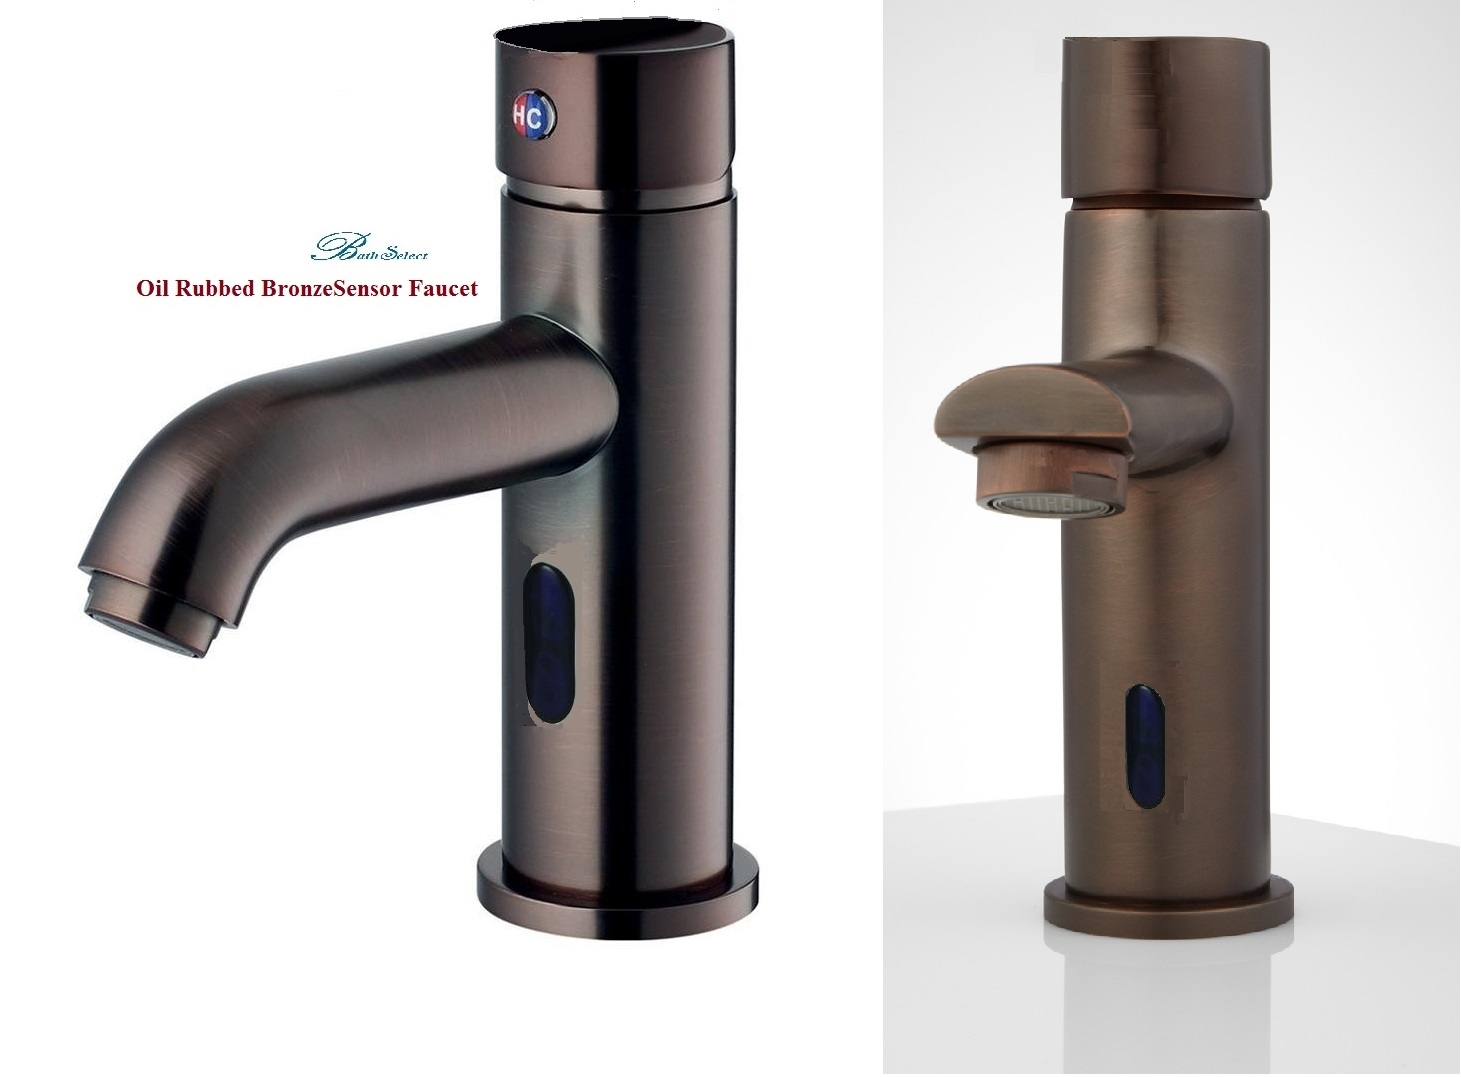 motion sensor bathroom faucet motion sensor bathroom faucet oil rubbed bronze motion sensor faucets 1461 x 1077